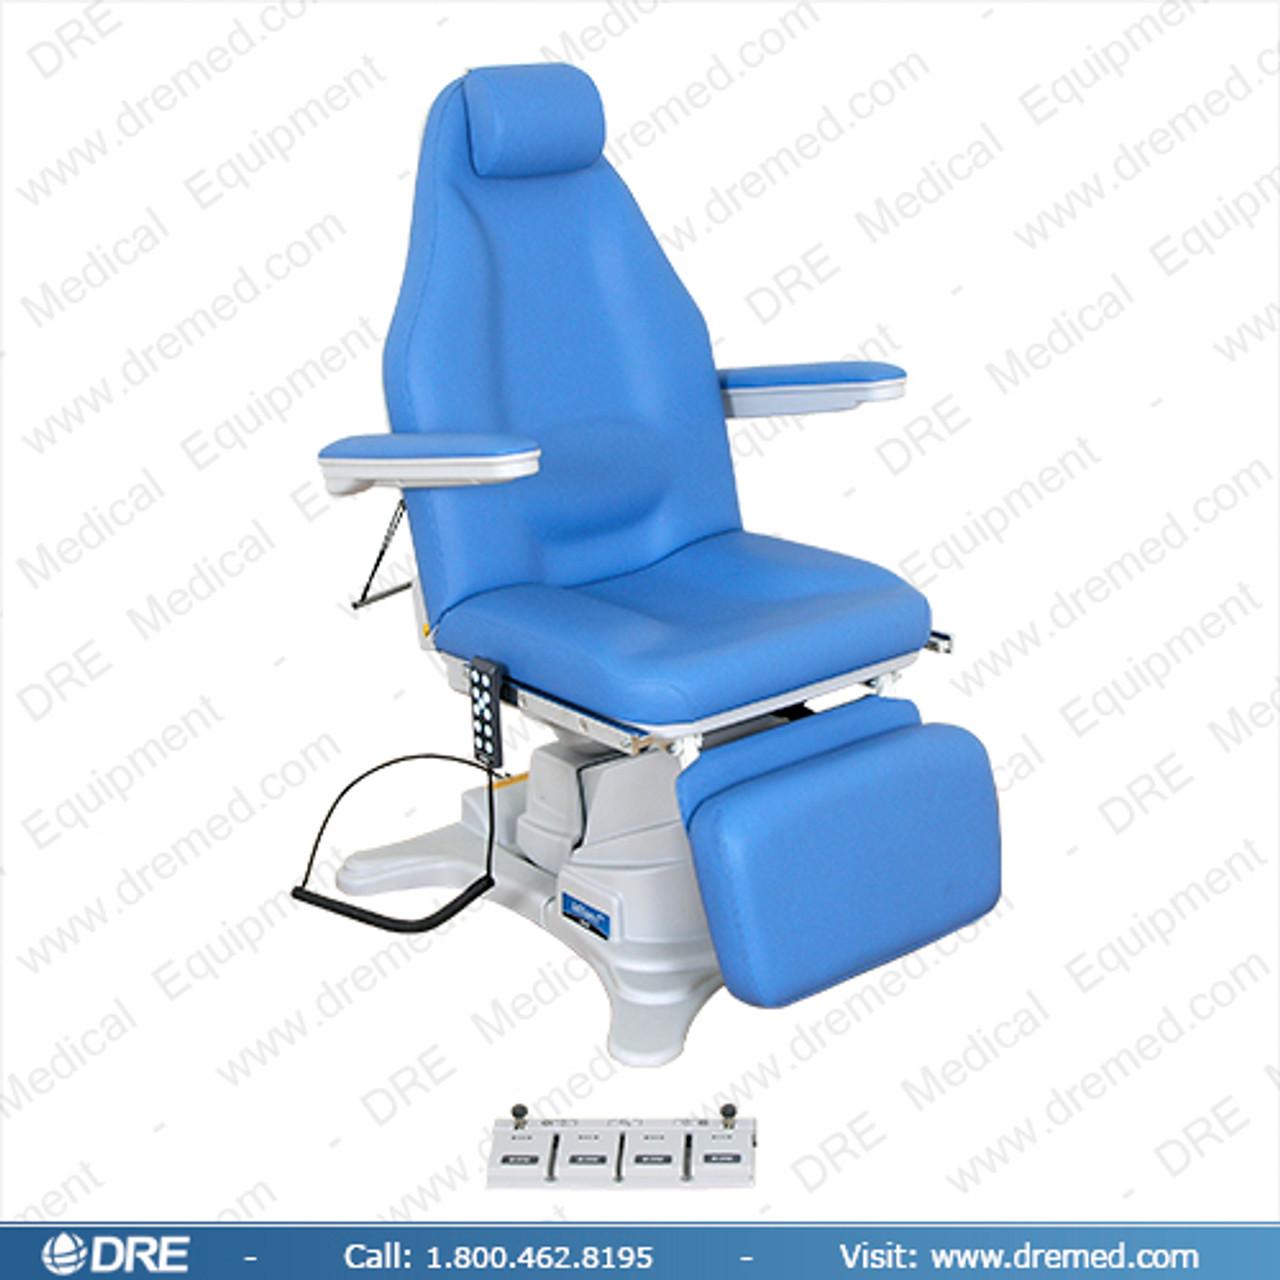 DRE Milano E20 Power Procedure Chair/Black Color